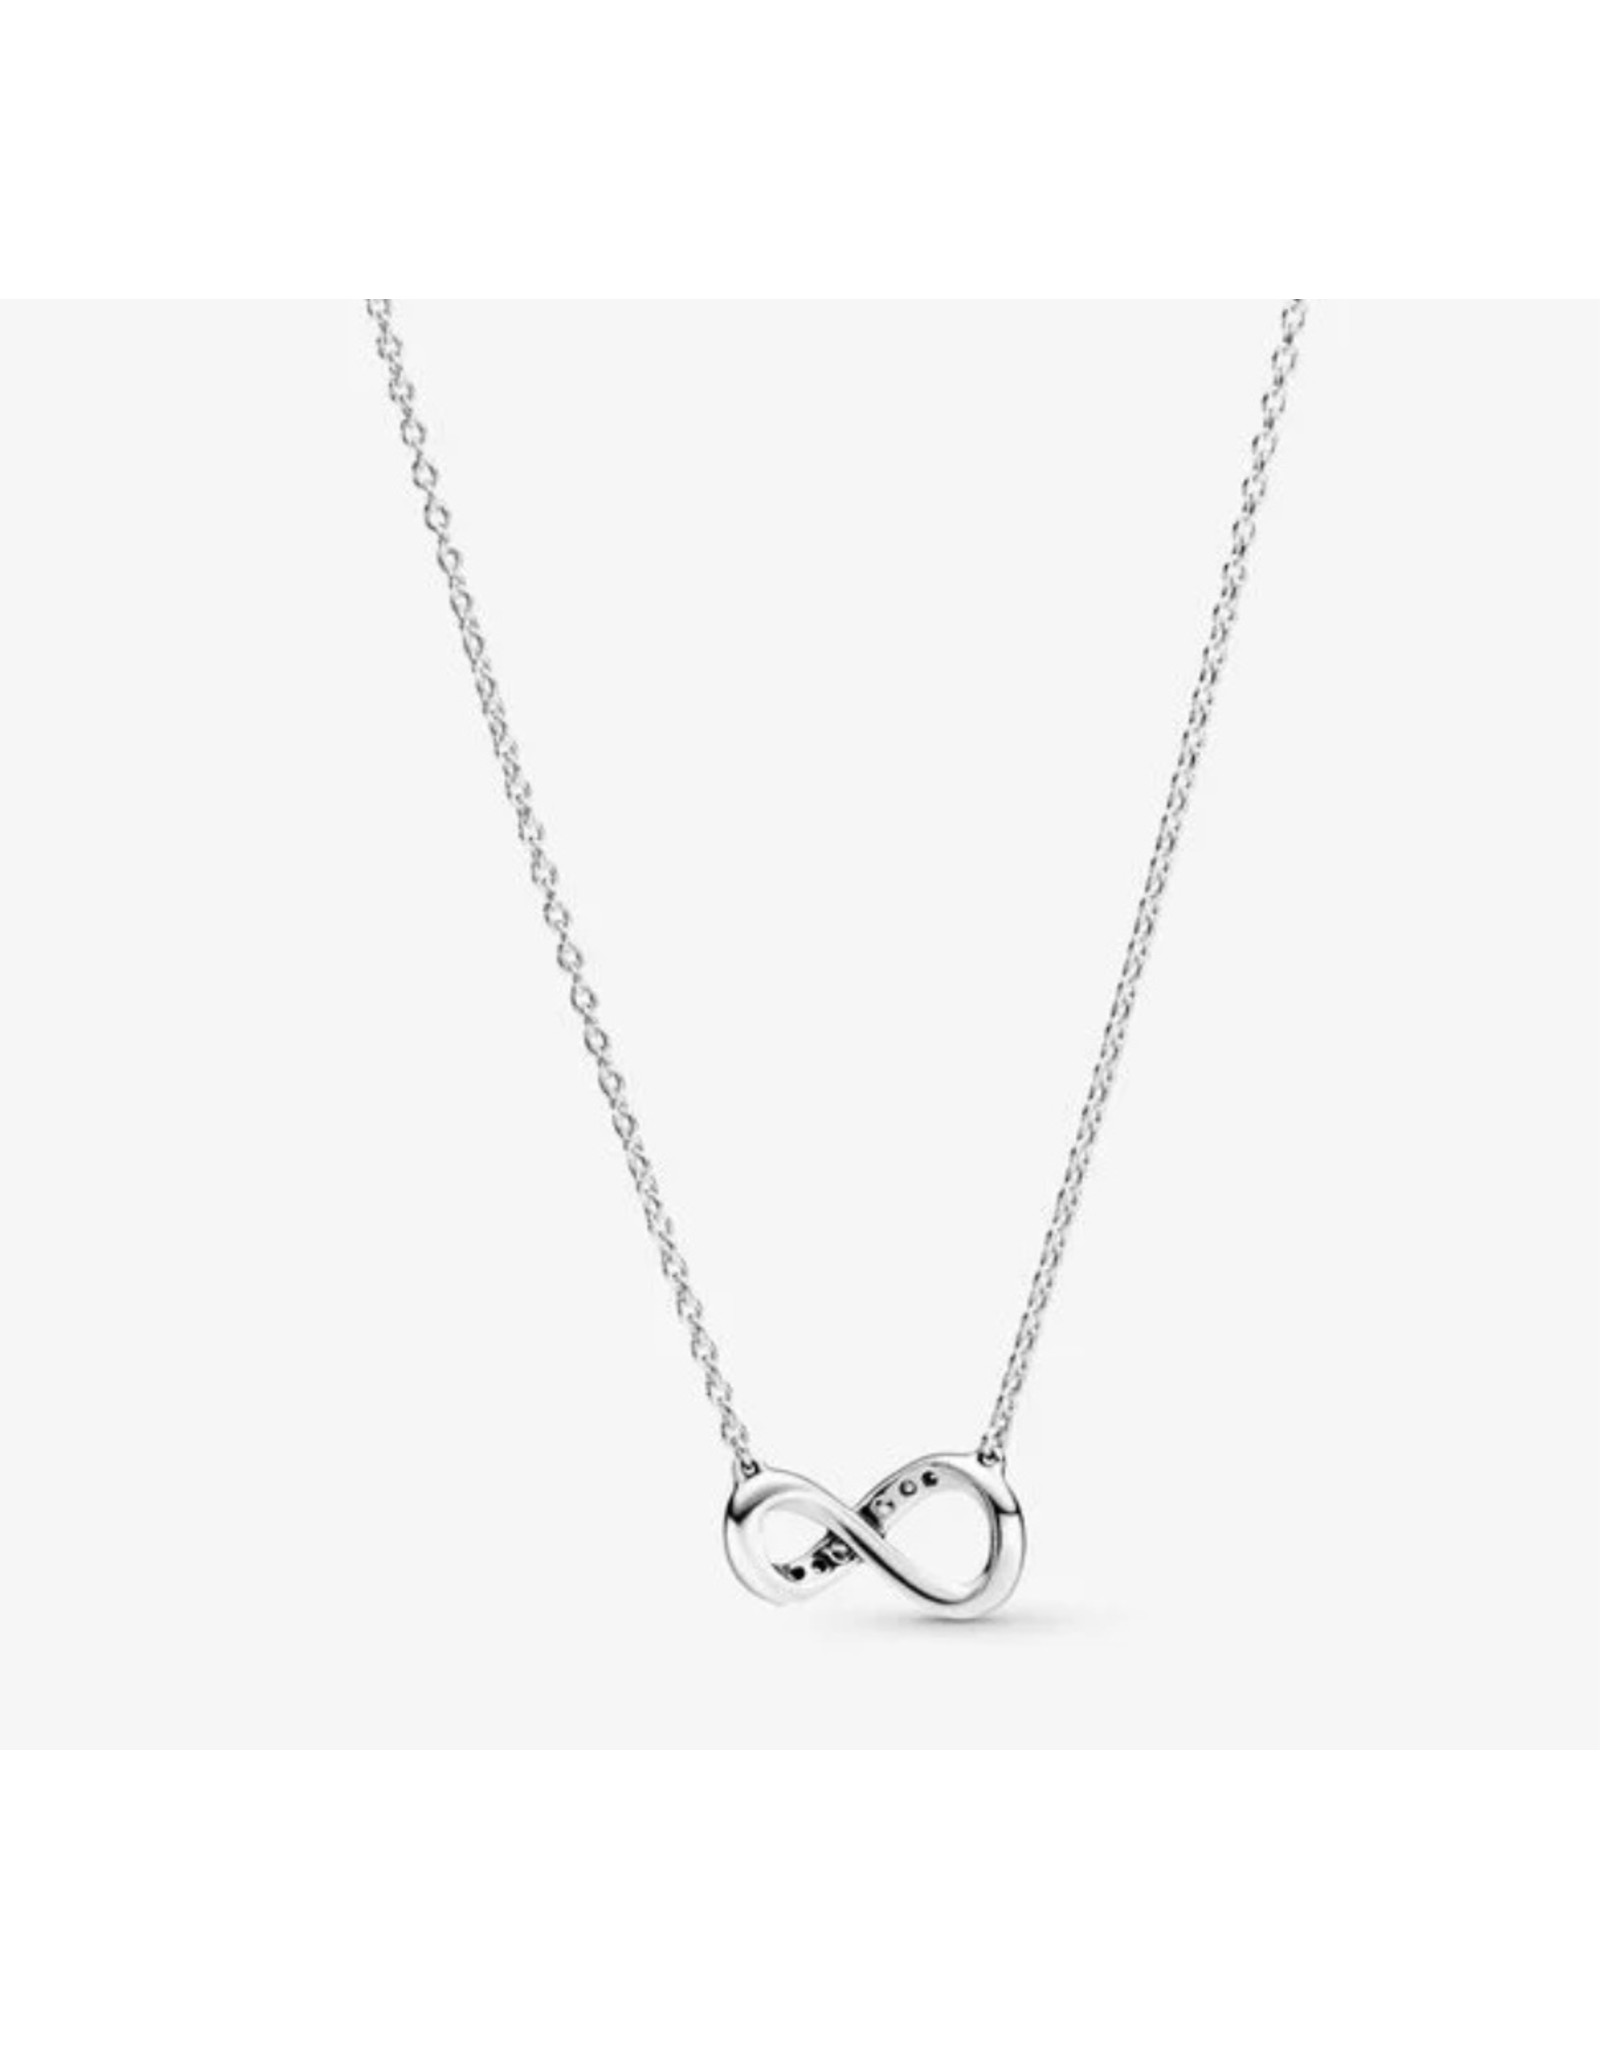 Pandora Pandora Necklace,398821C01-50, Sparkling Infinity